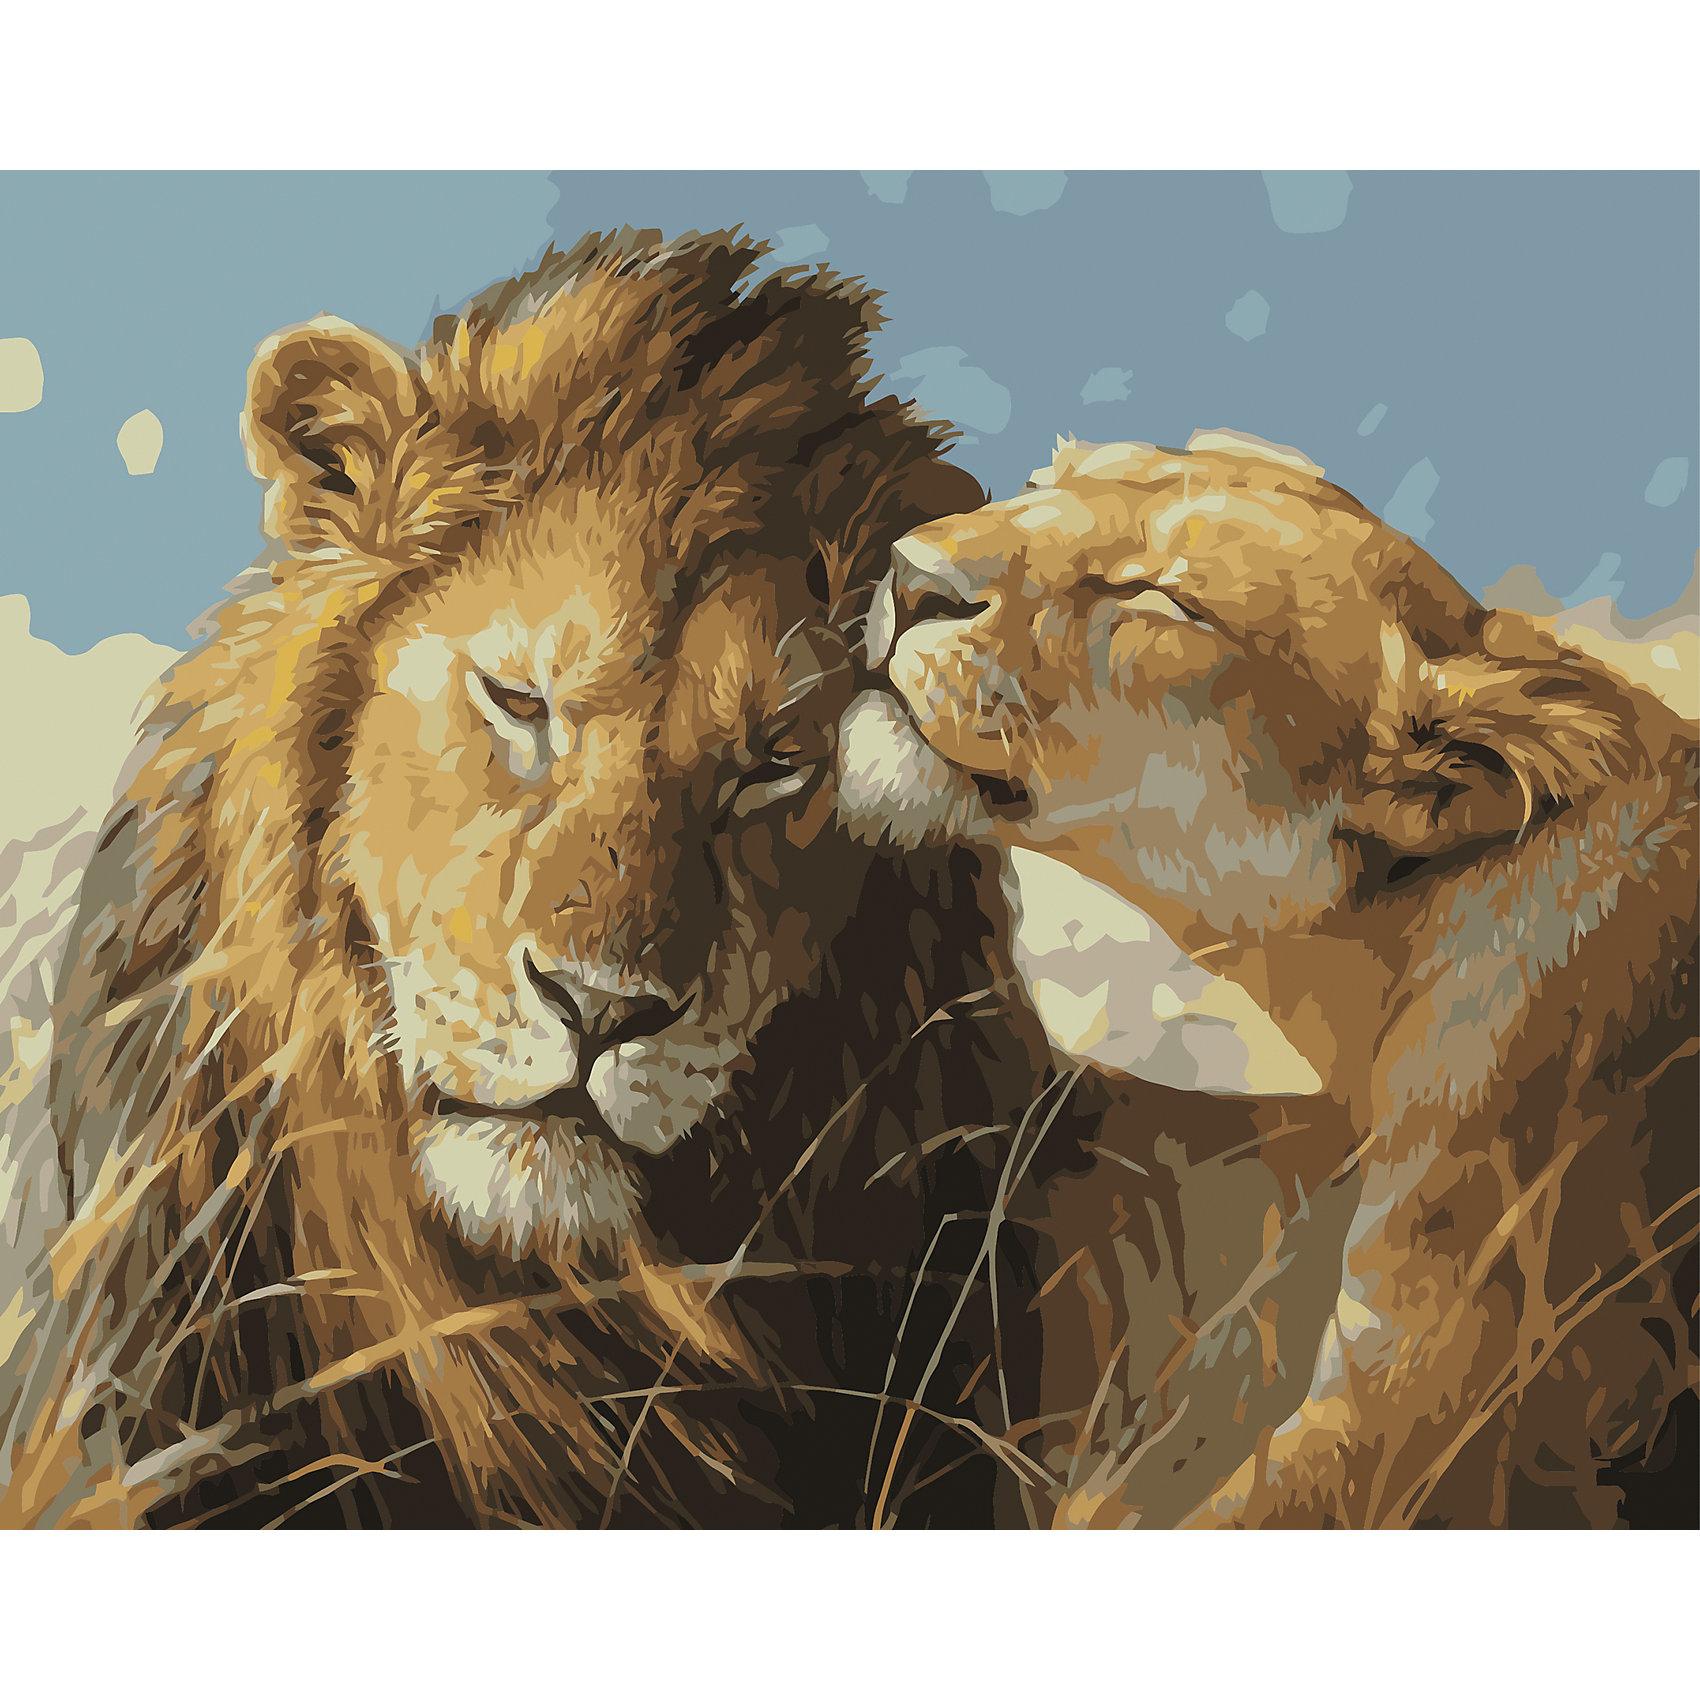 TUKZAR Роспись по номерам Львиная пара 40*50 см tukzar роспись по номерам тигры 40 50 см